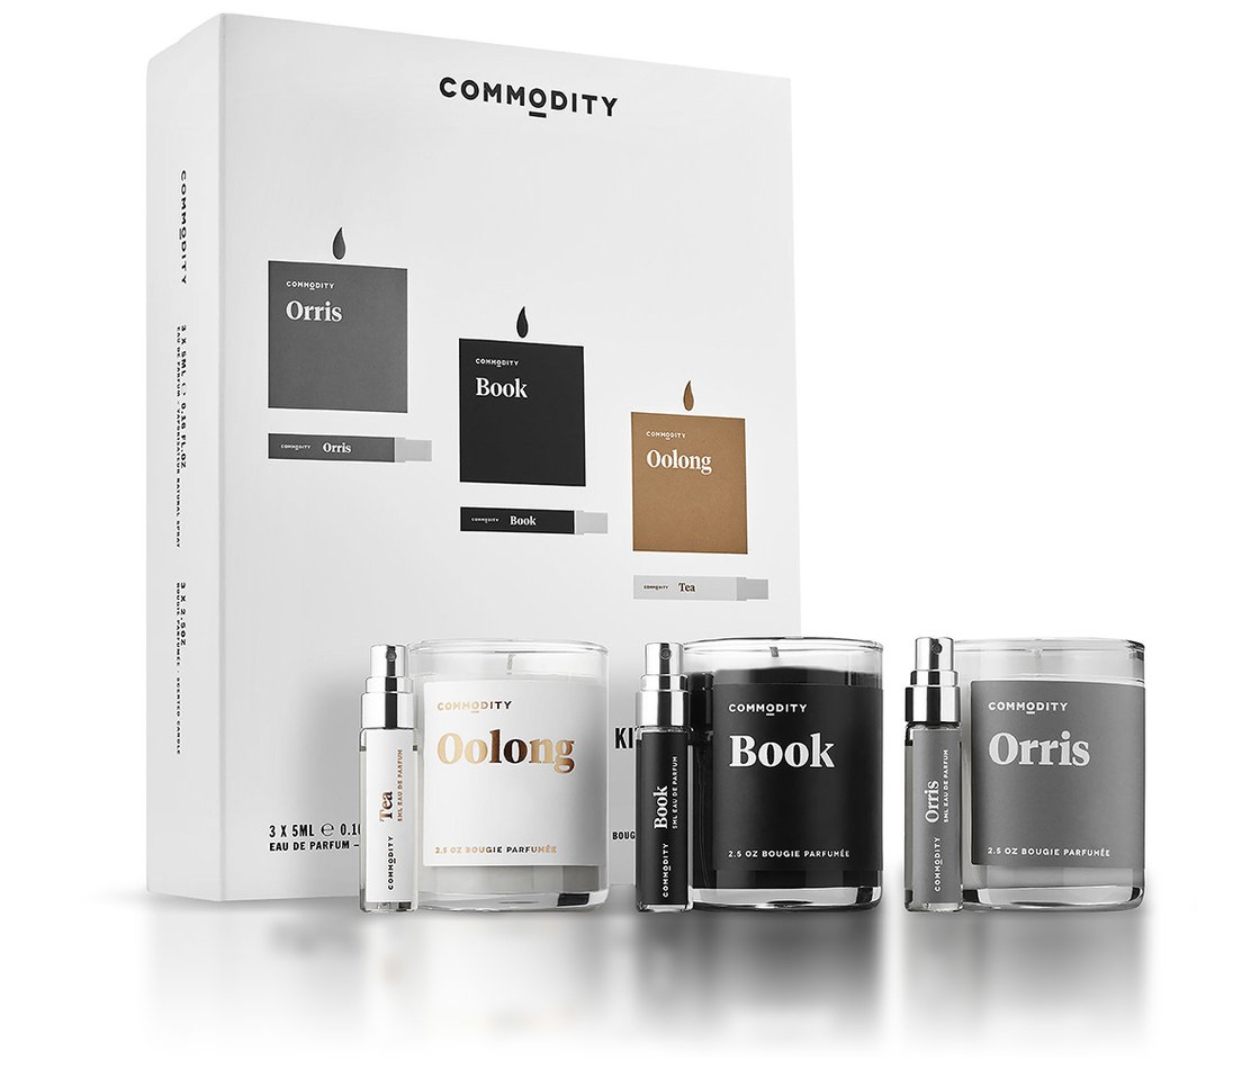 Commodity 3x3 Exploration Kit